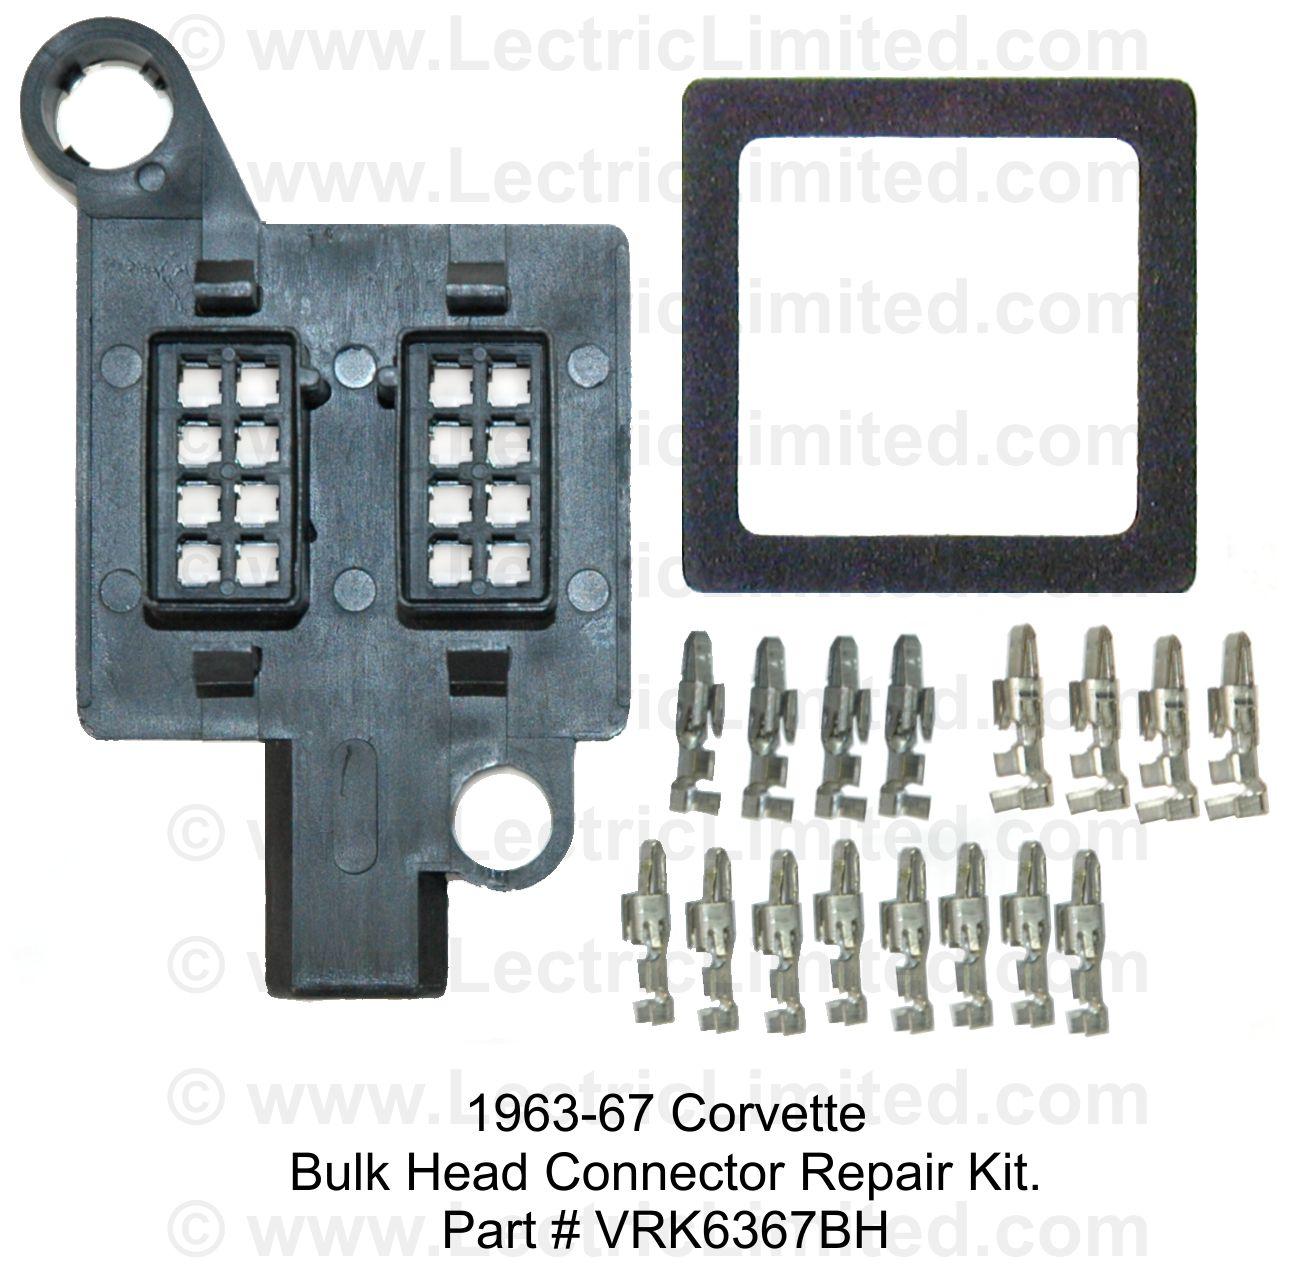 hight resolution of bulkhead connector repair kit